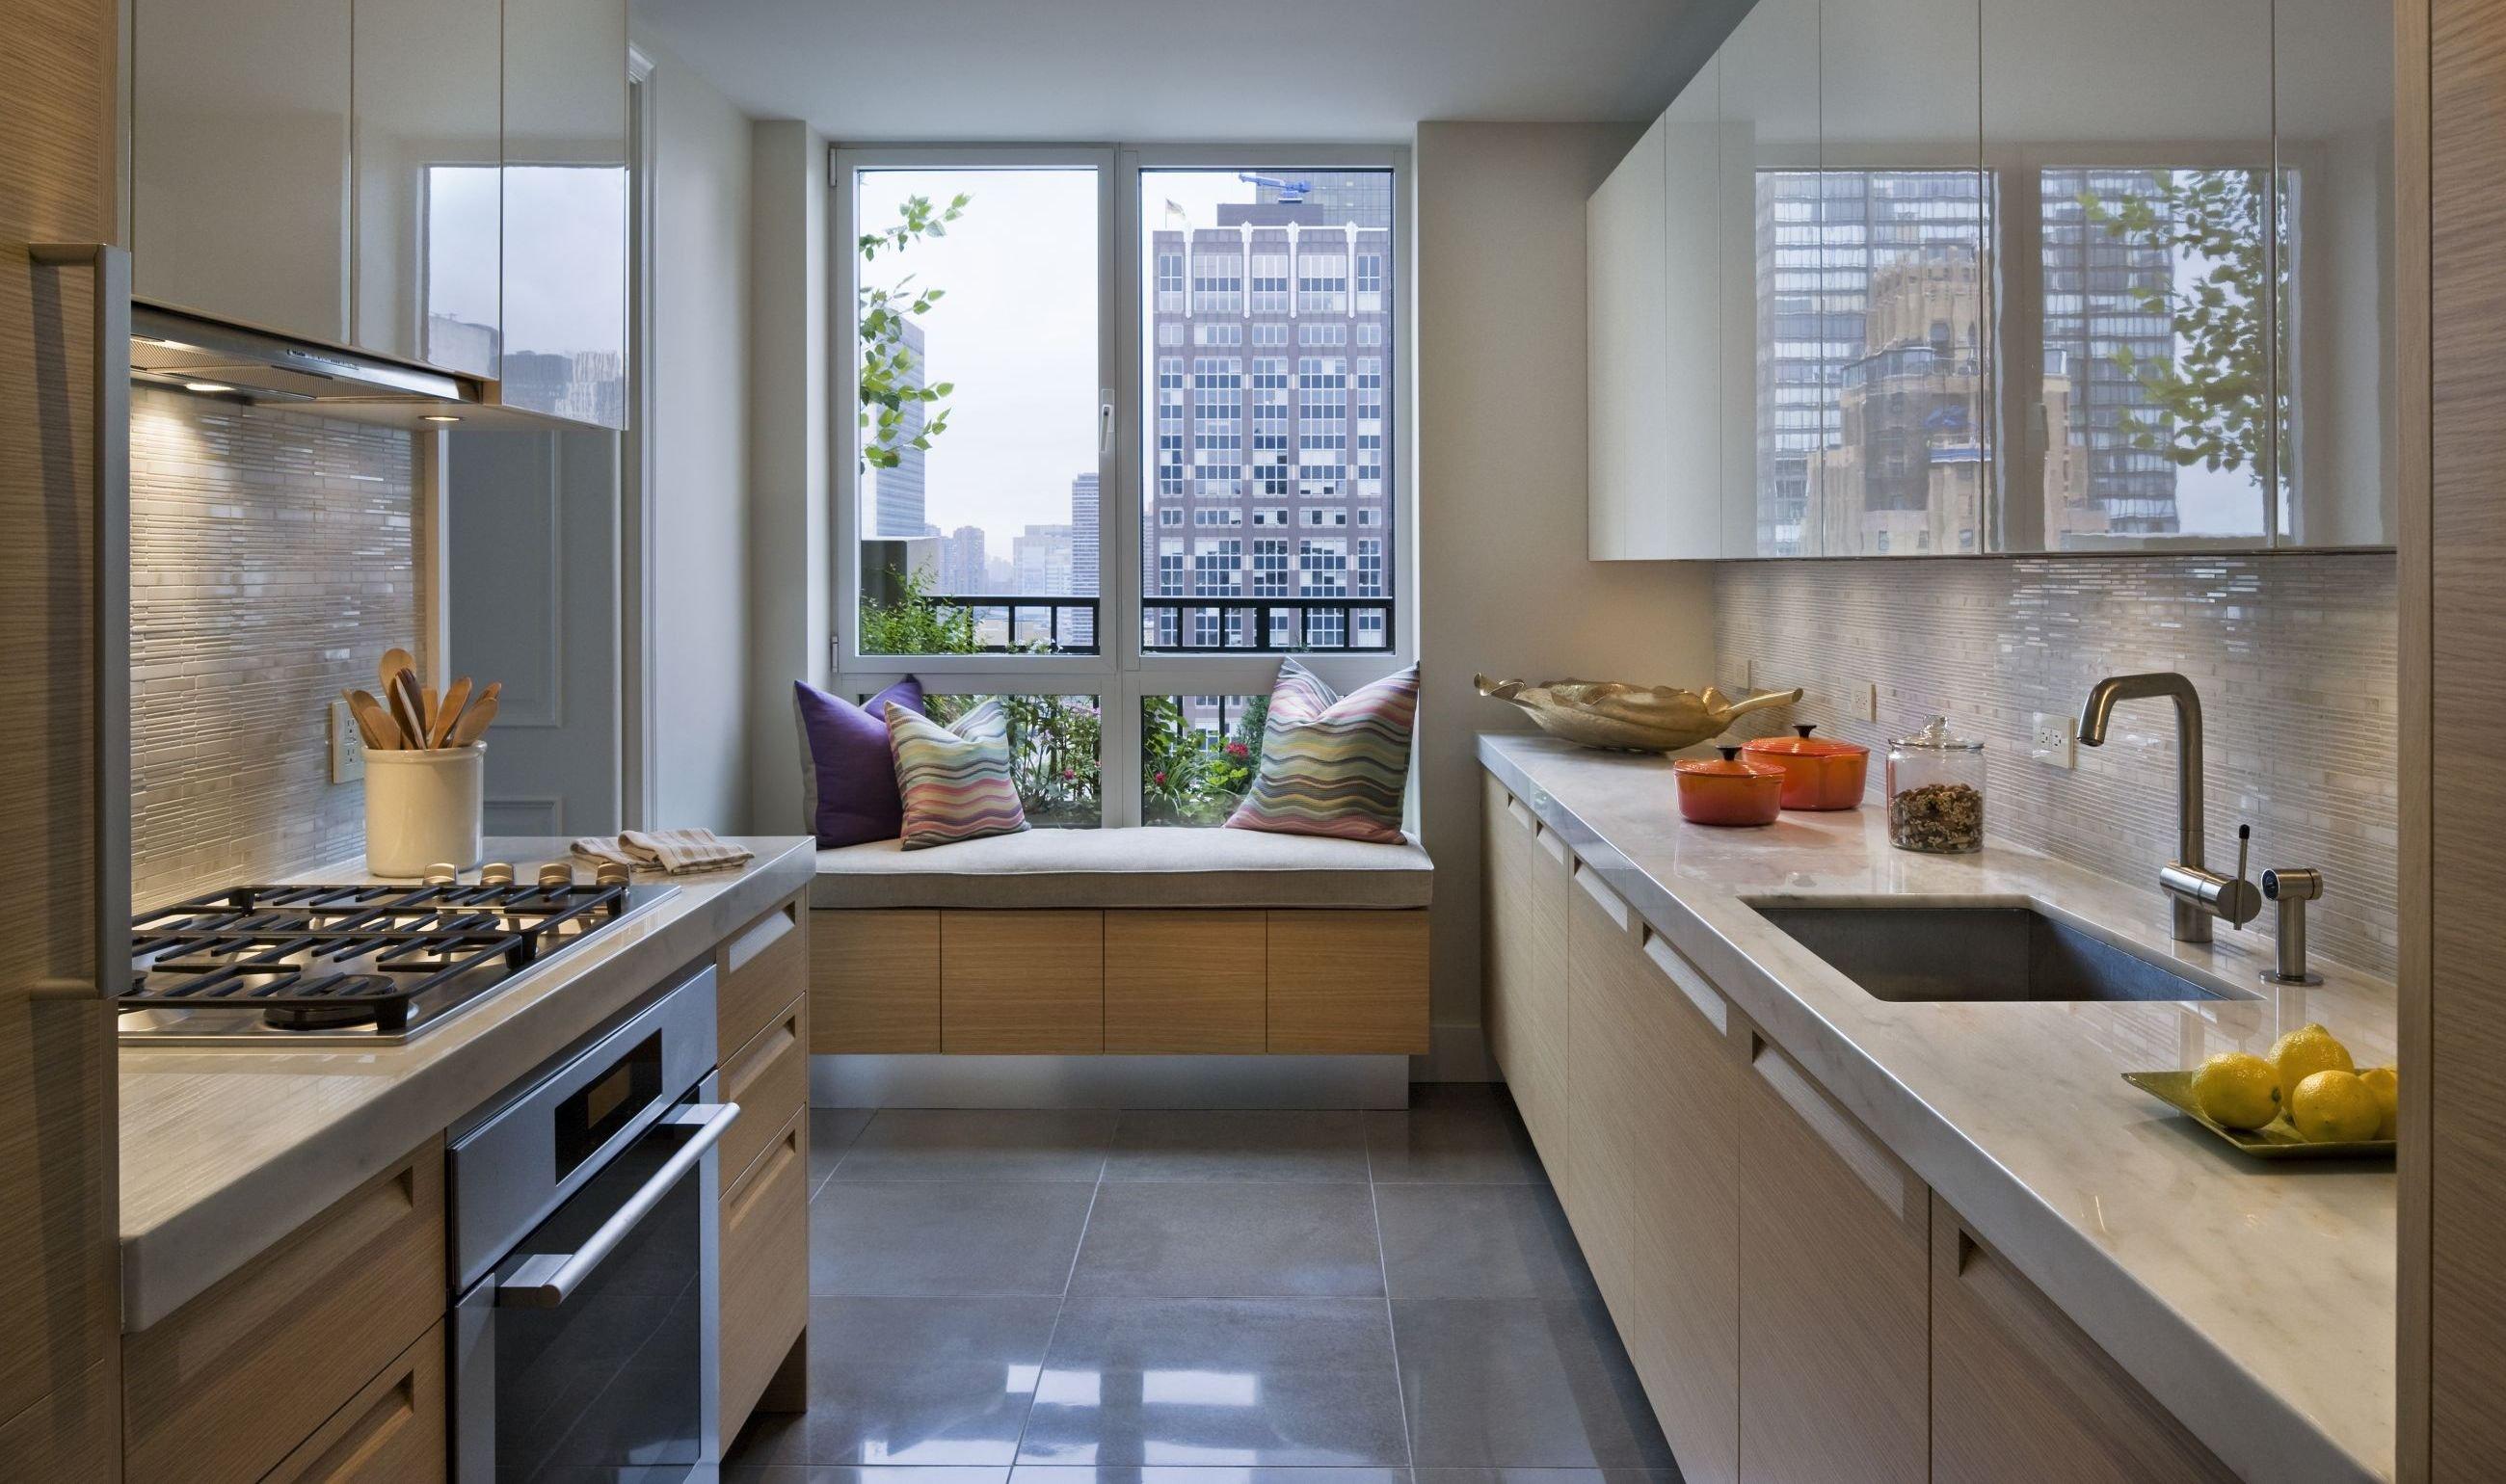 Угловые кухни с выходом на балкон фото